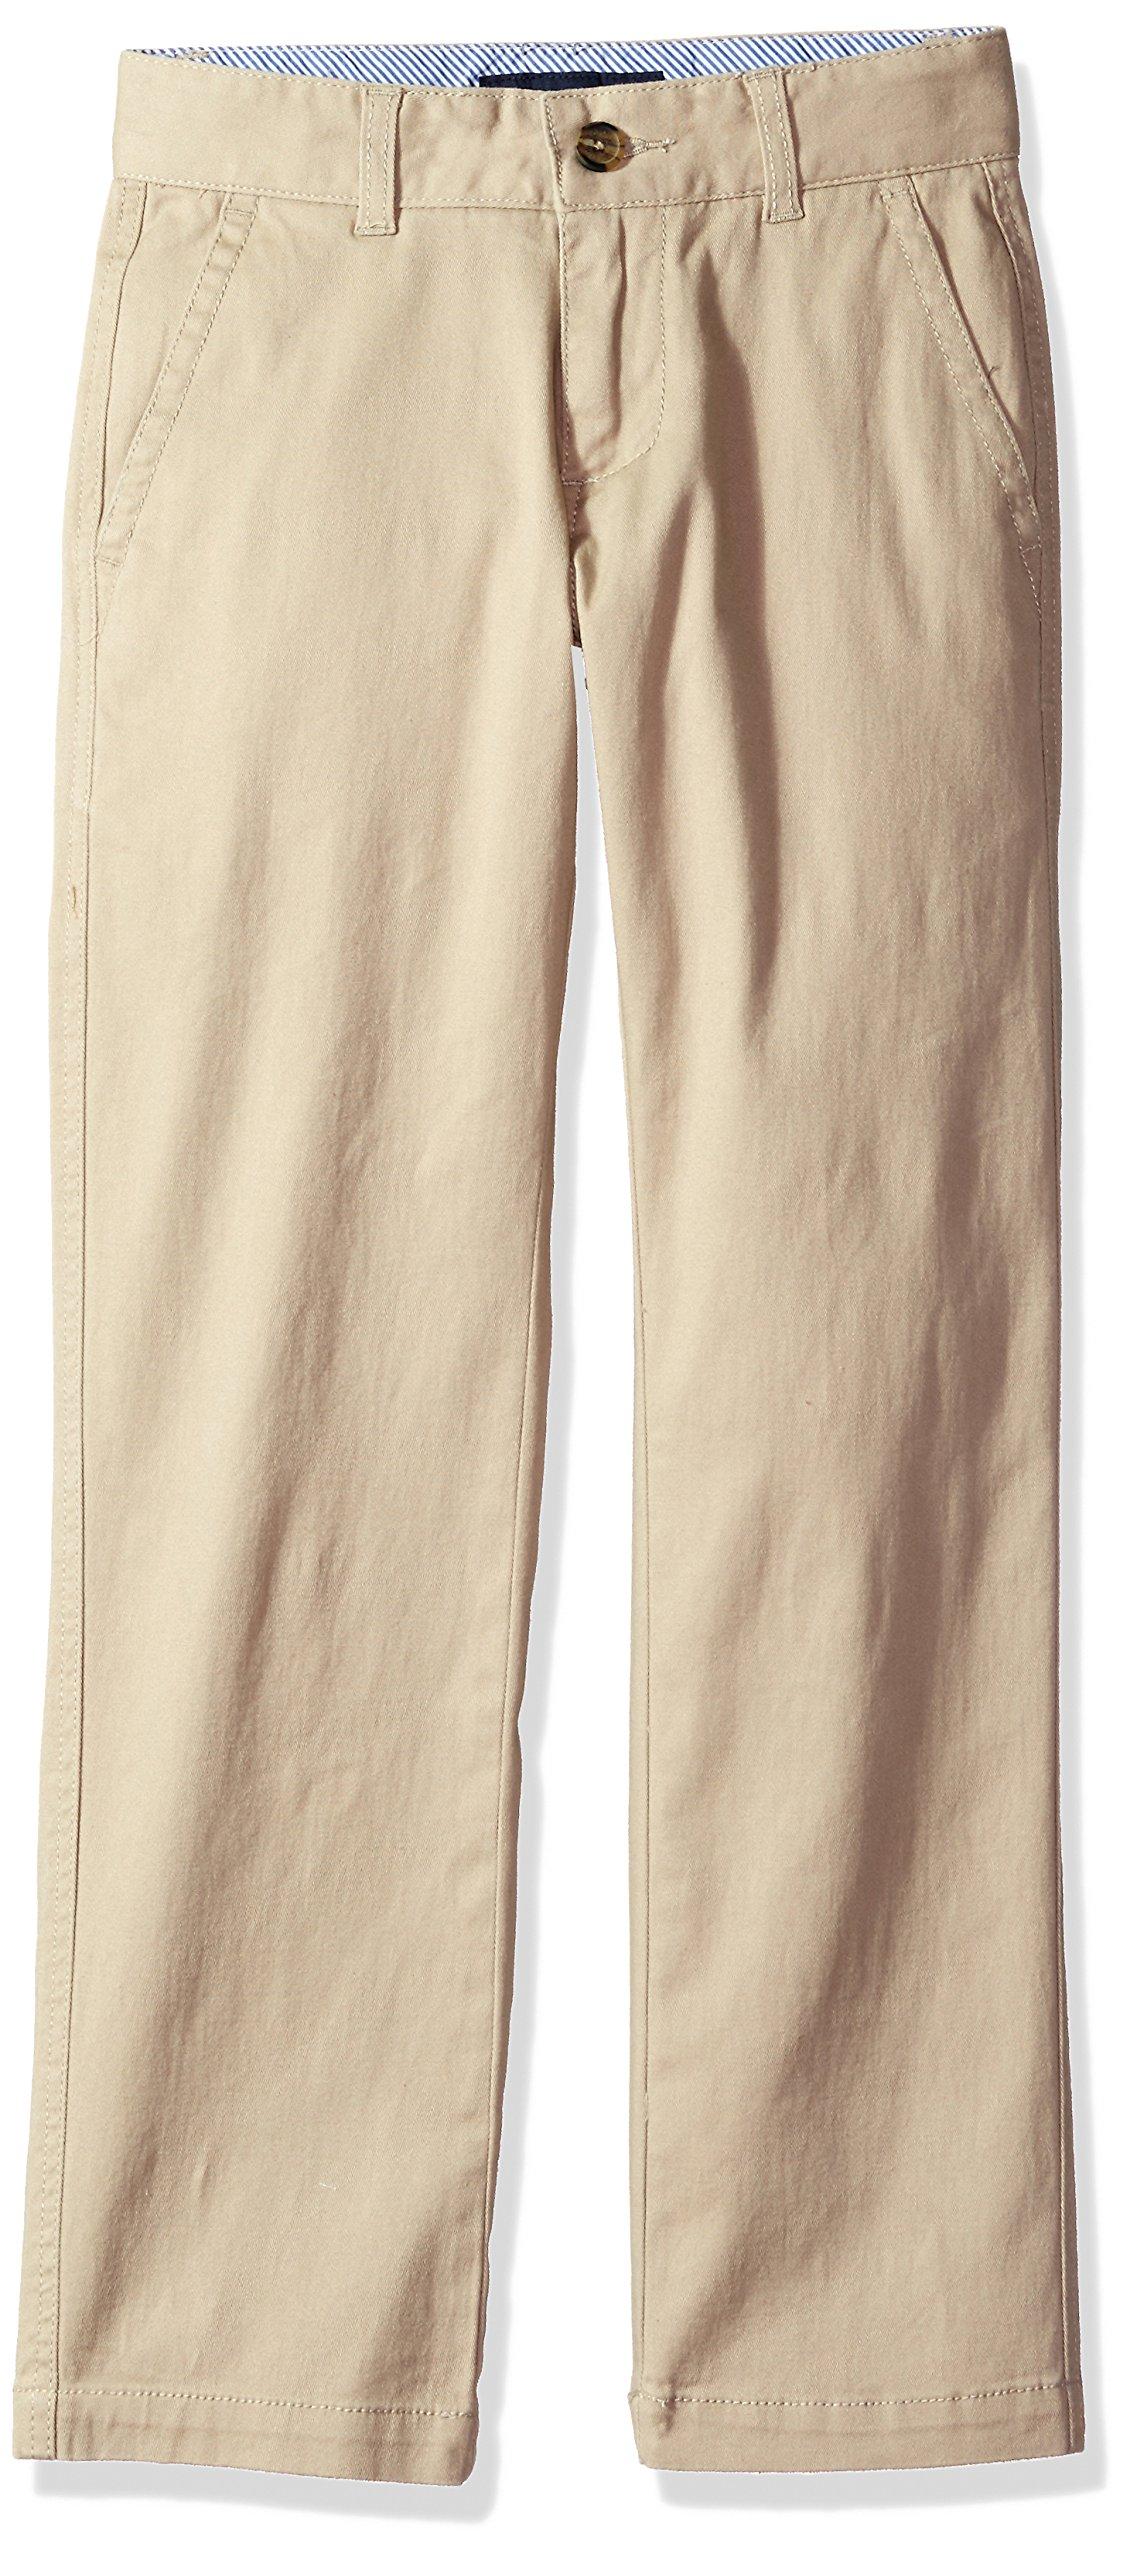 Tommy Hilfiger Boy's Big Academy Chino Pant, Travel Khaki, 12